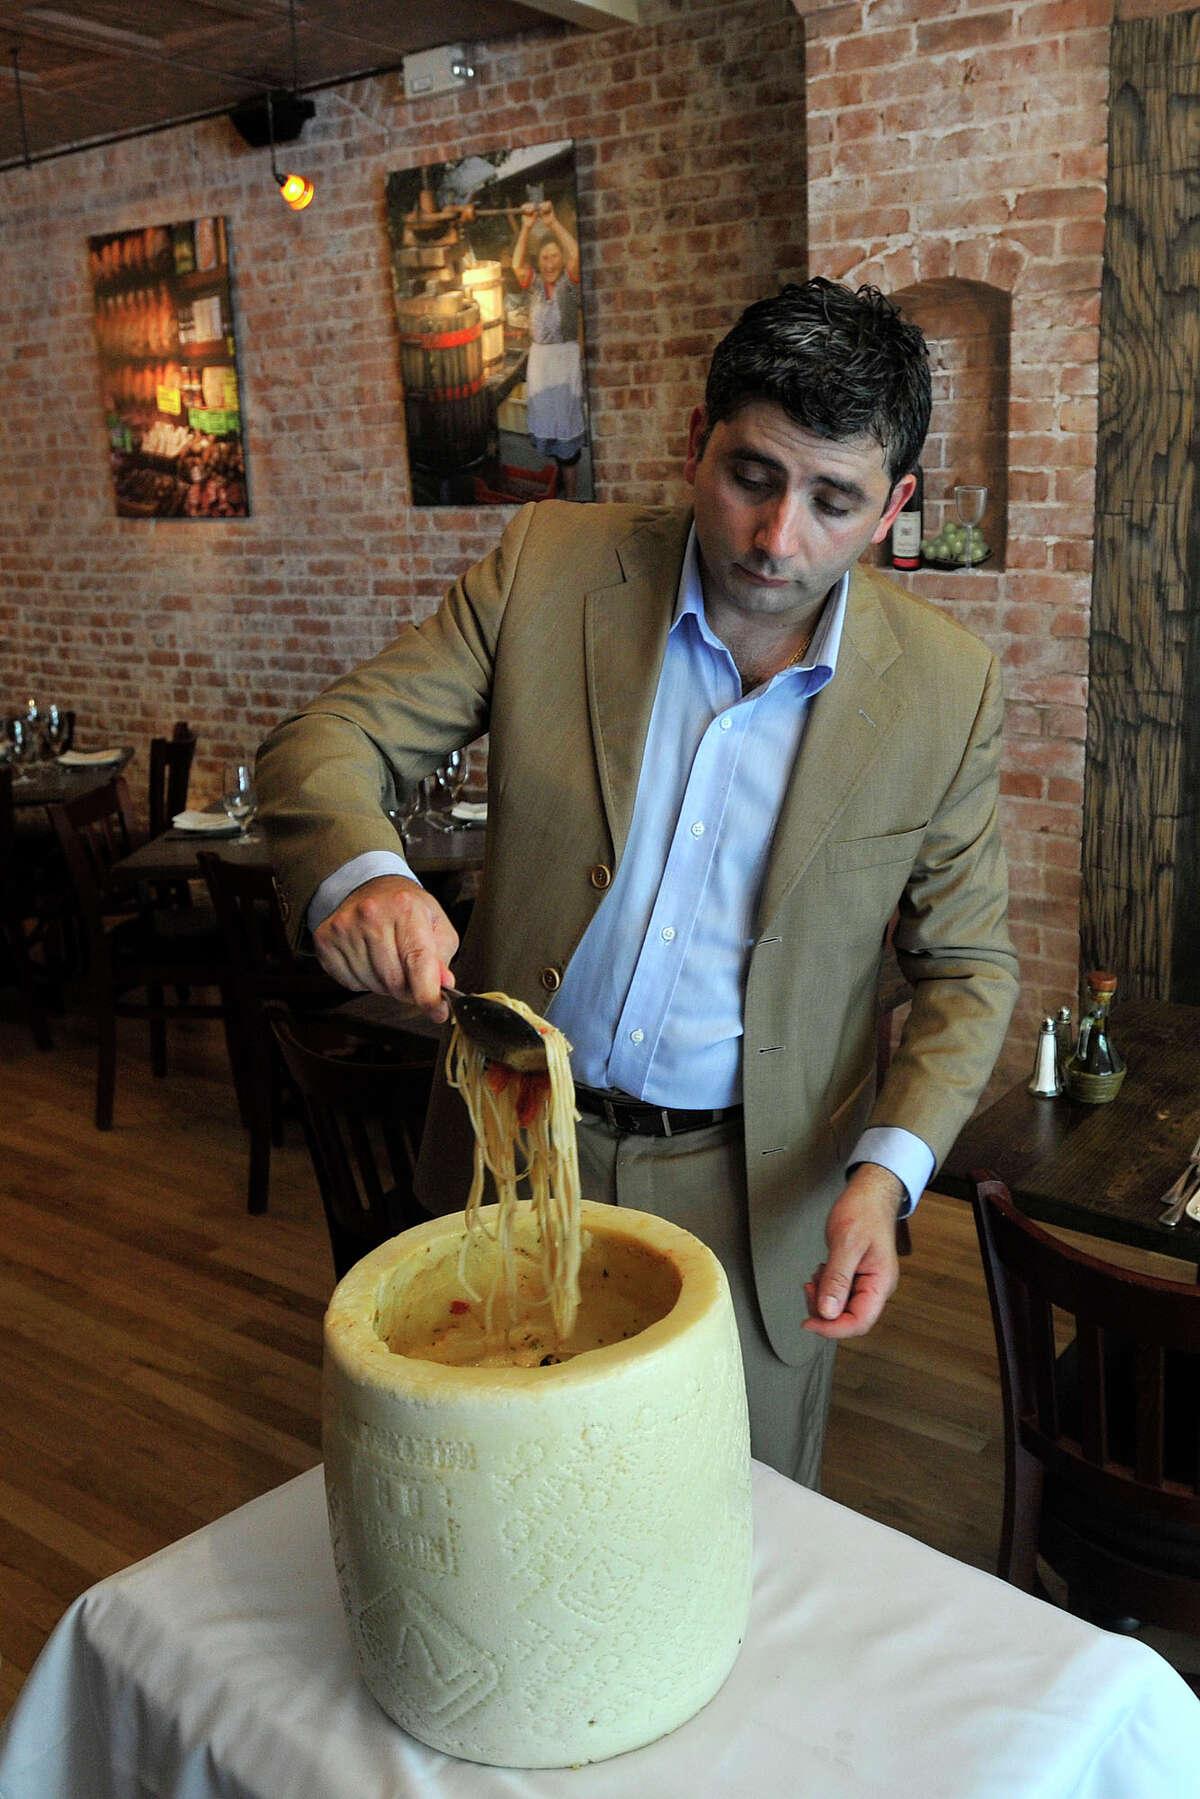 Owner Giuseppi Cinque shows off the restaurant's spaghetto alla Cinque using durum semolina pasta served in a Bambino pecorino wheel of cheese at Quartino Trattoria and Vineria in South Norwalk, Conn., on Wednesday, July 2, 2014.